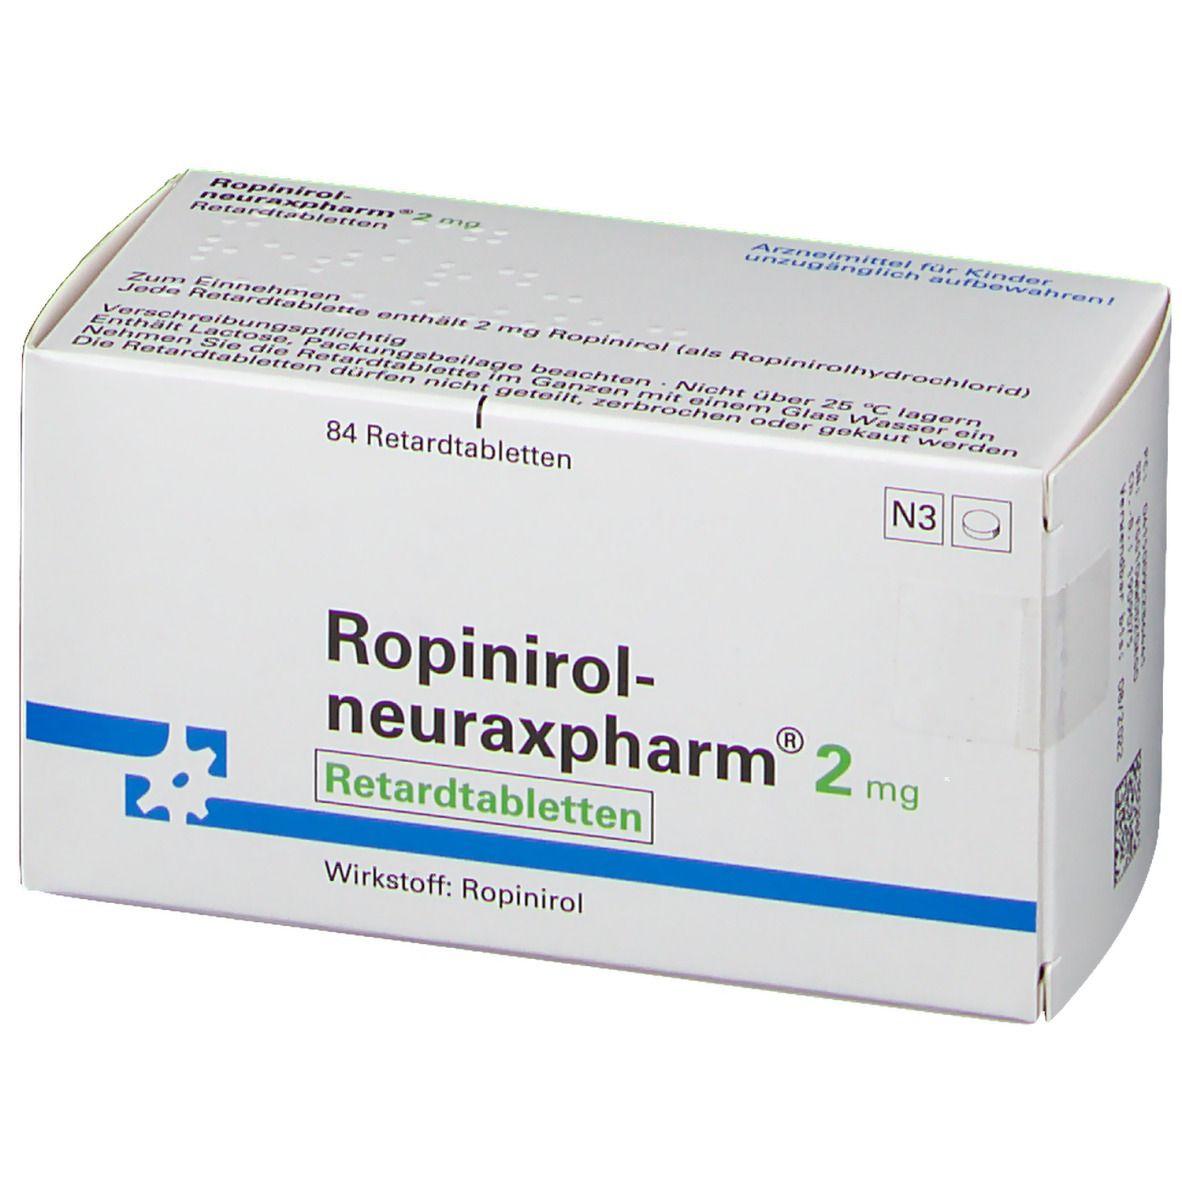 ROPINIROL neuraxpharm 2 mg Retardtabletten